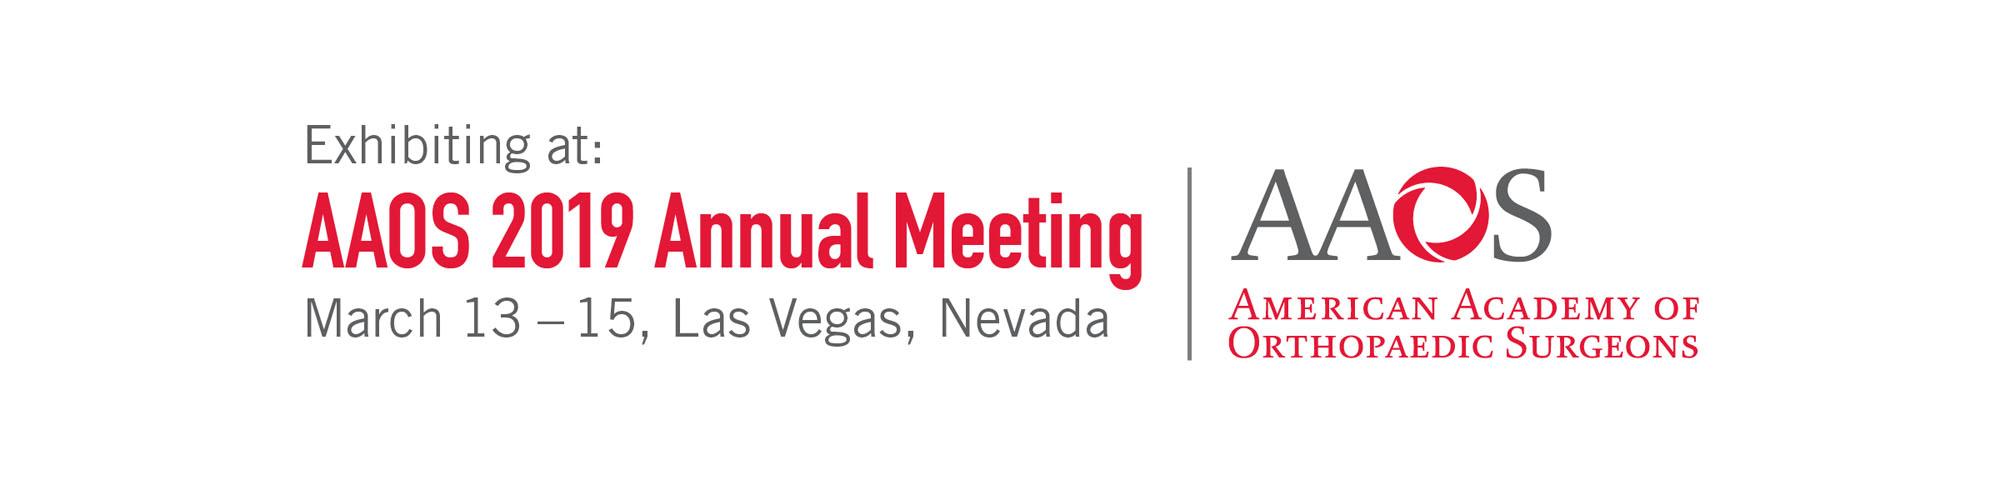 AAOS exhibiting logo